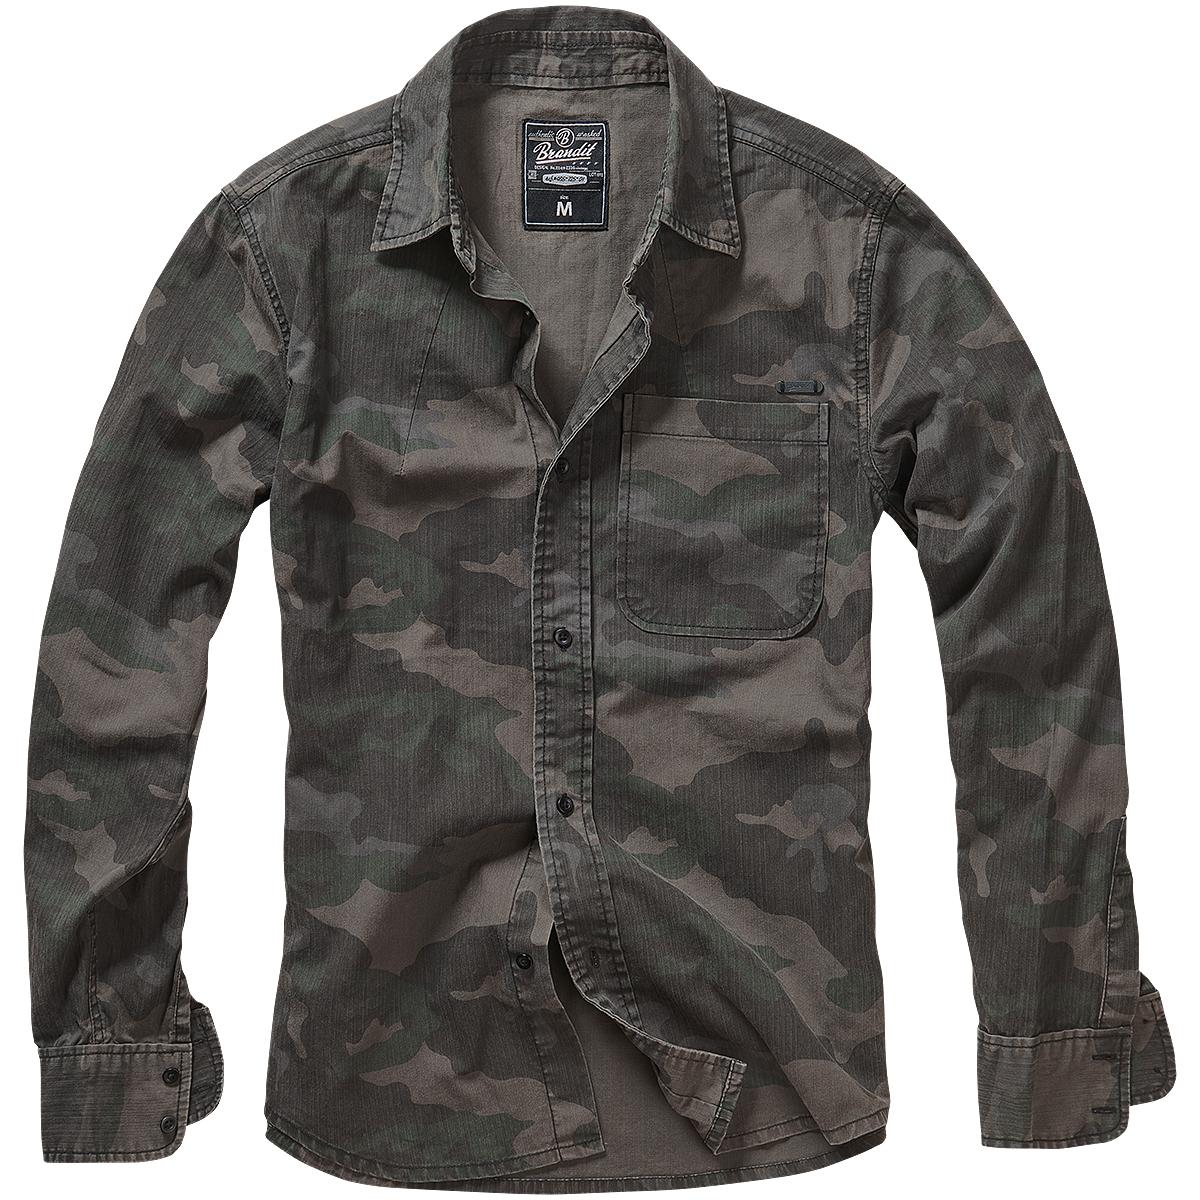 Brandit-Josh-Camisa-Manga-Larga-Senderismo-Hombres-Ejercito-Algodon-Dark-Camo